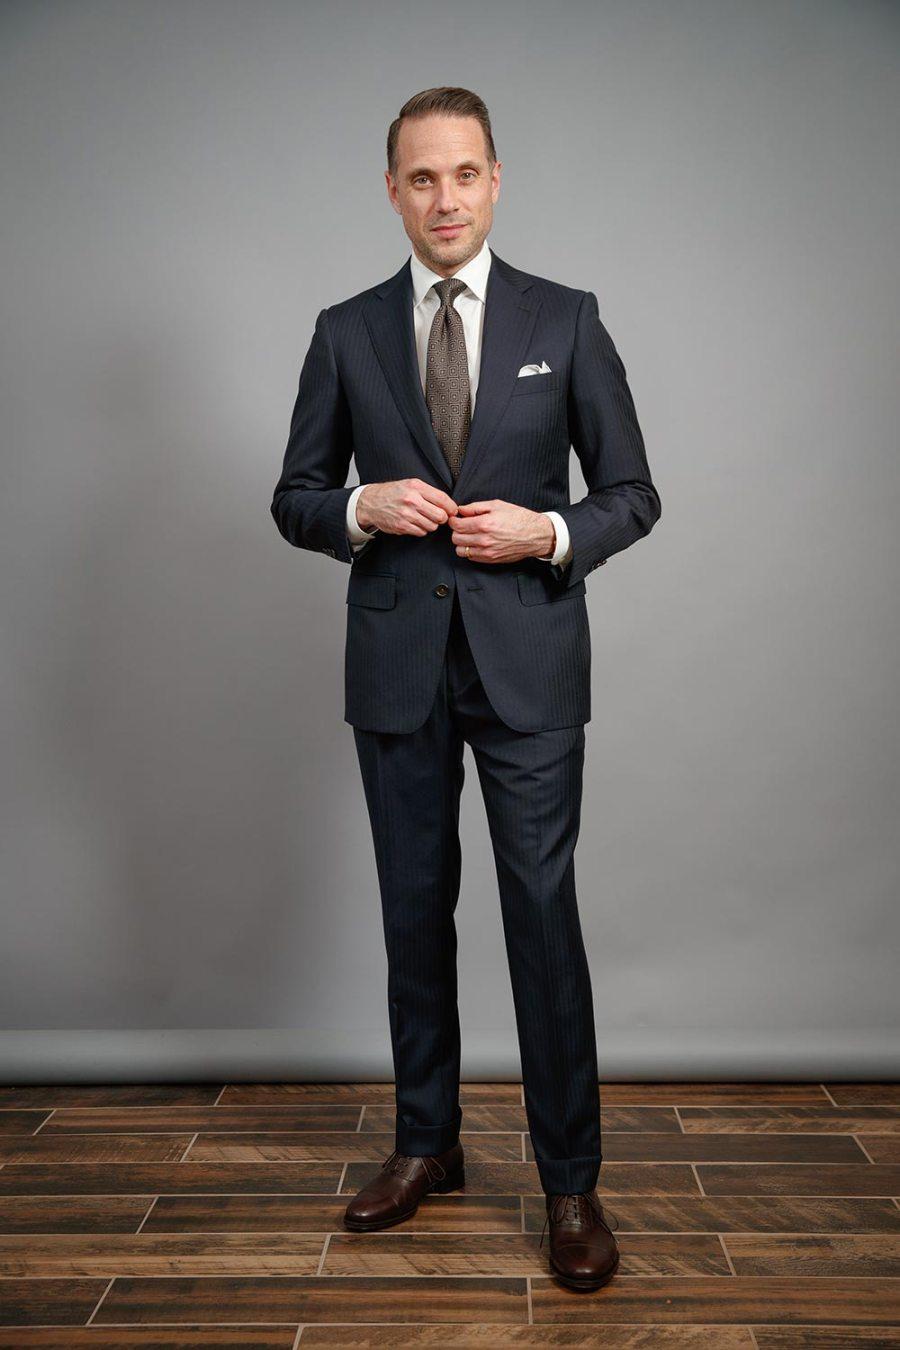 essential-white-poplin-dress-shirt-thomas-mason-navy-herringbone-suit-brown-oxford-shoes-brown-tie